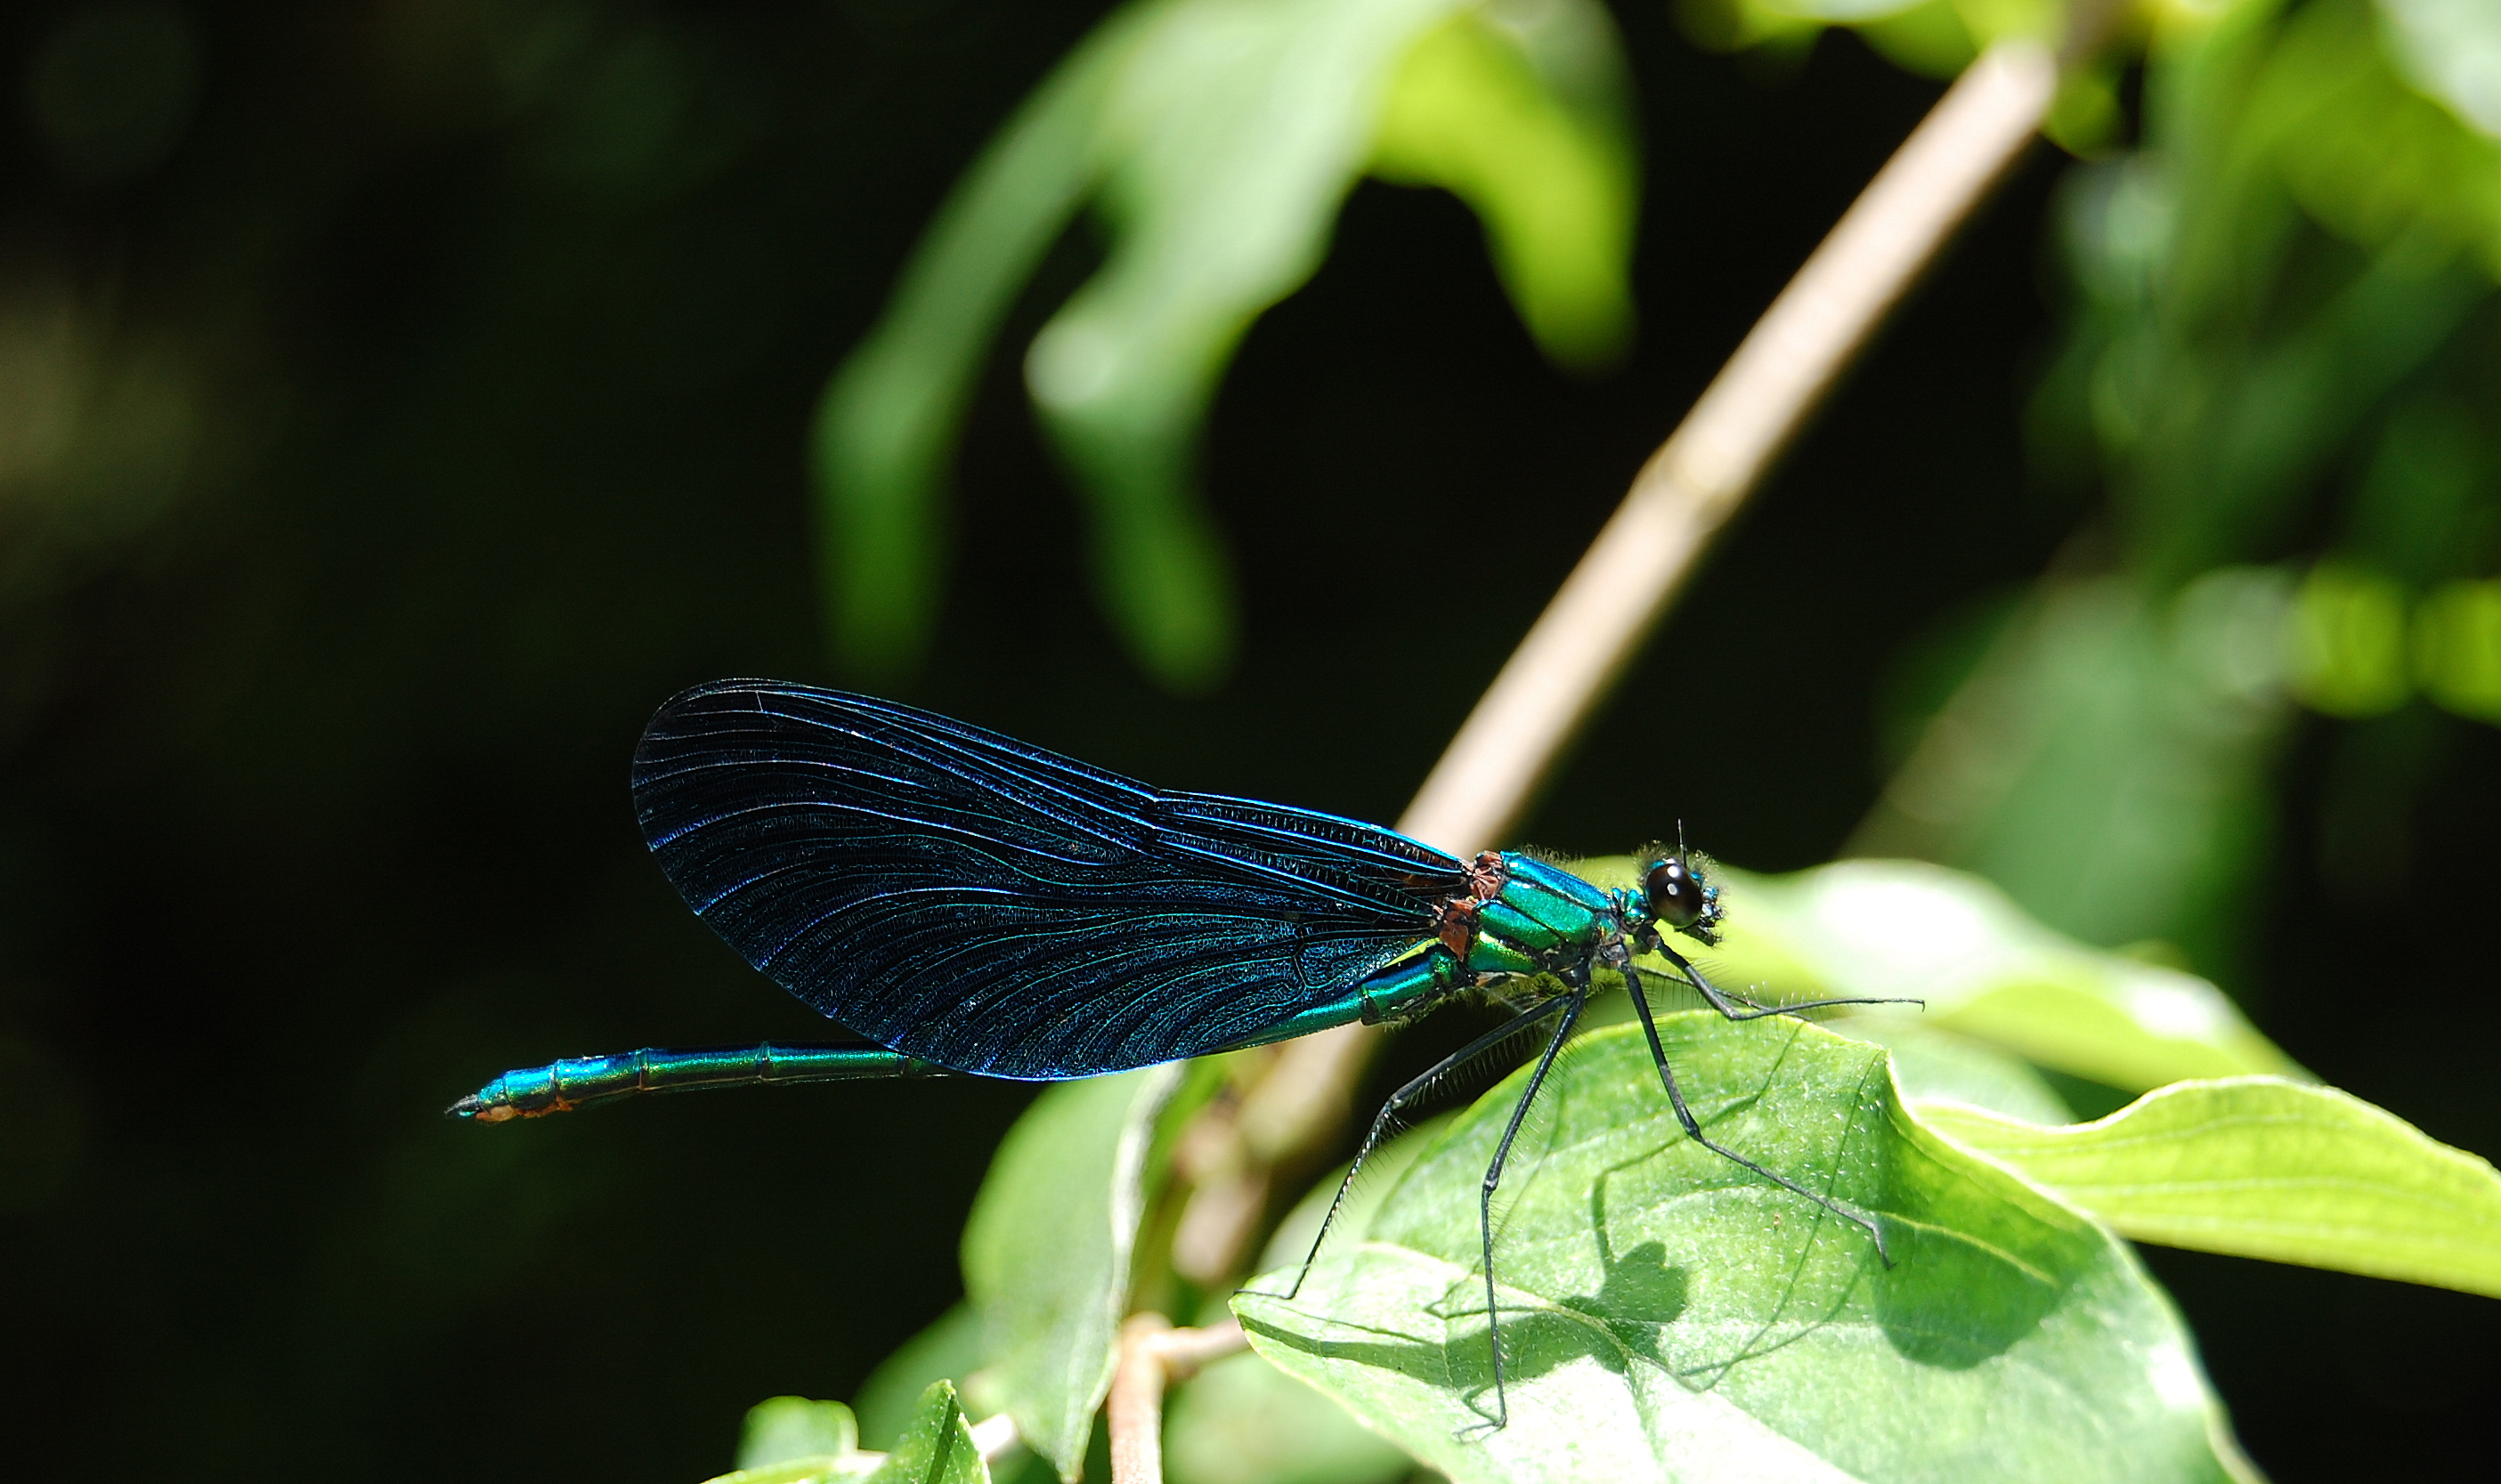 Blue_Dragonfly_Iski_Vingart